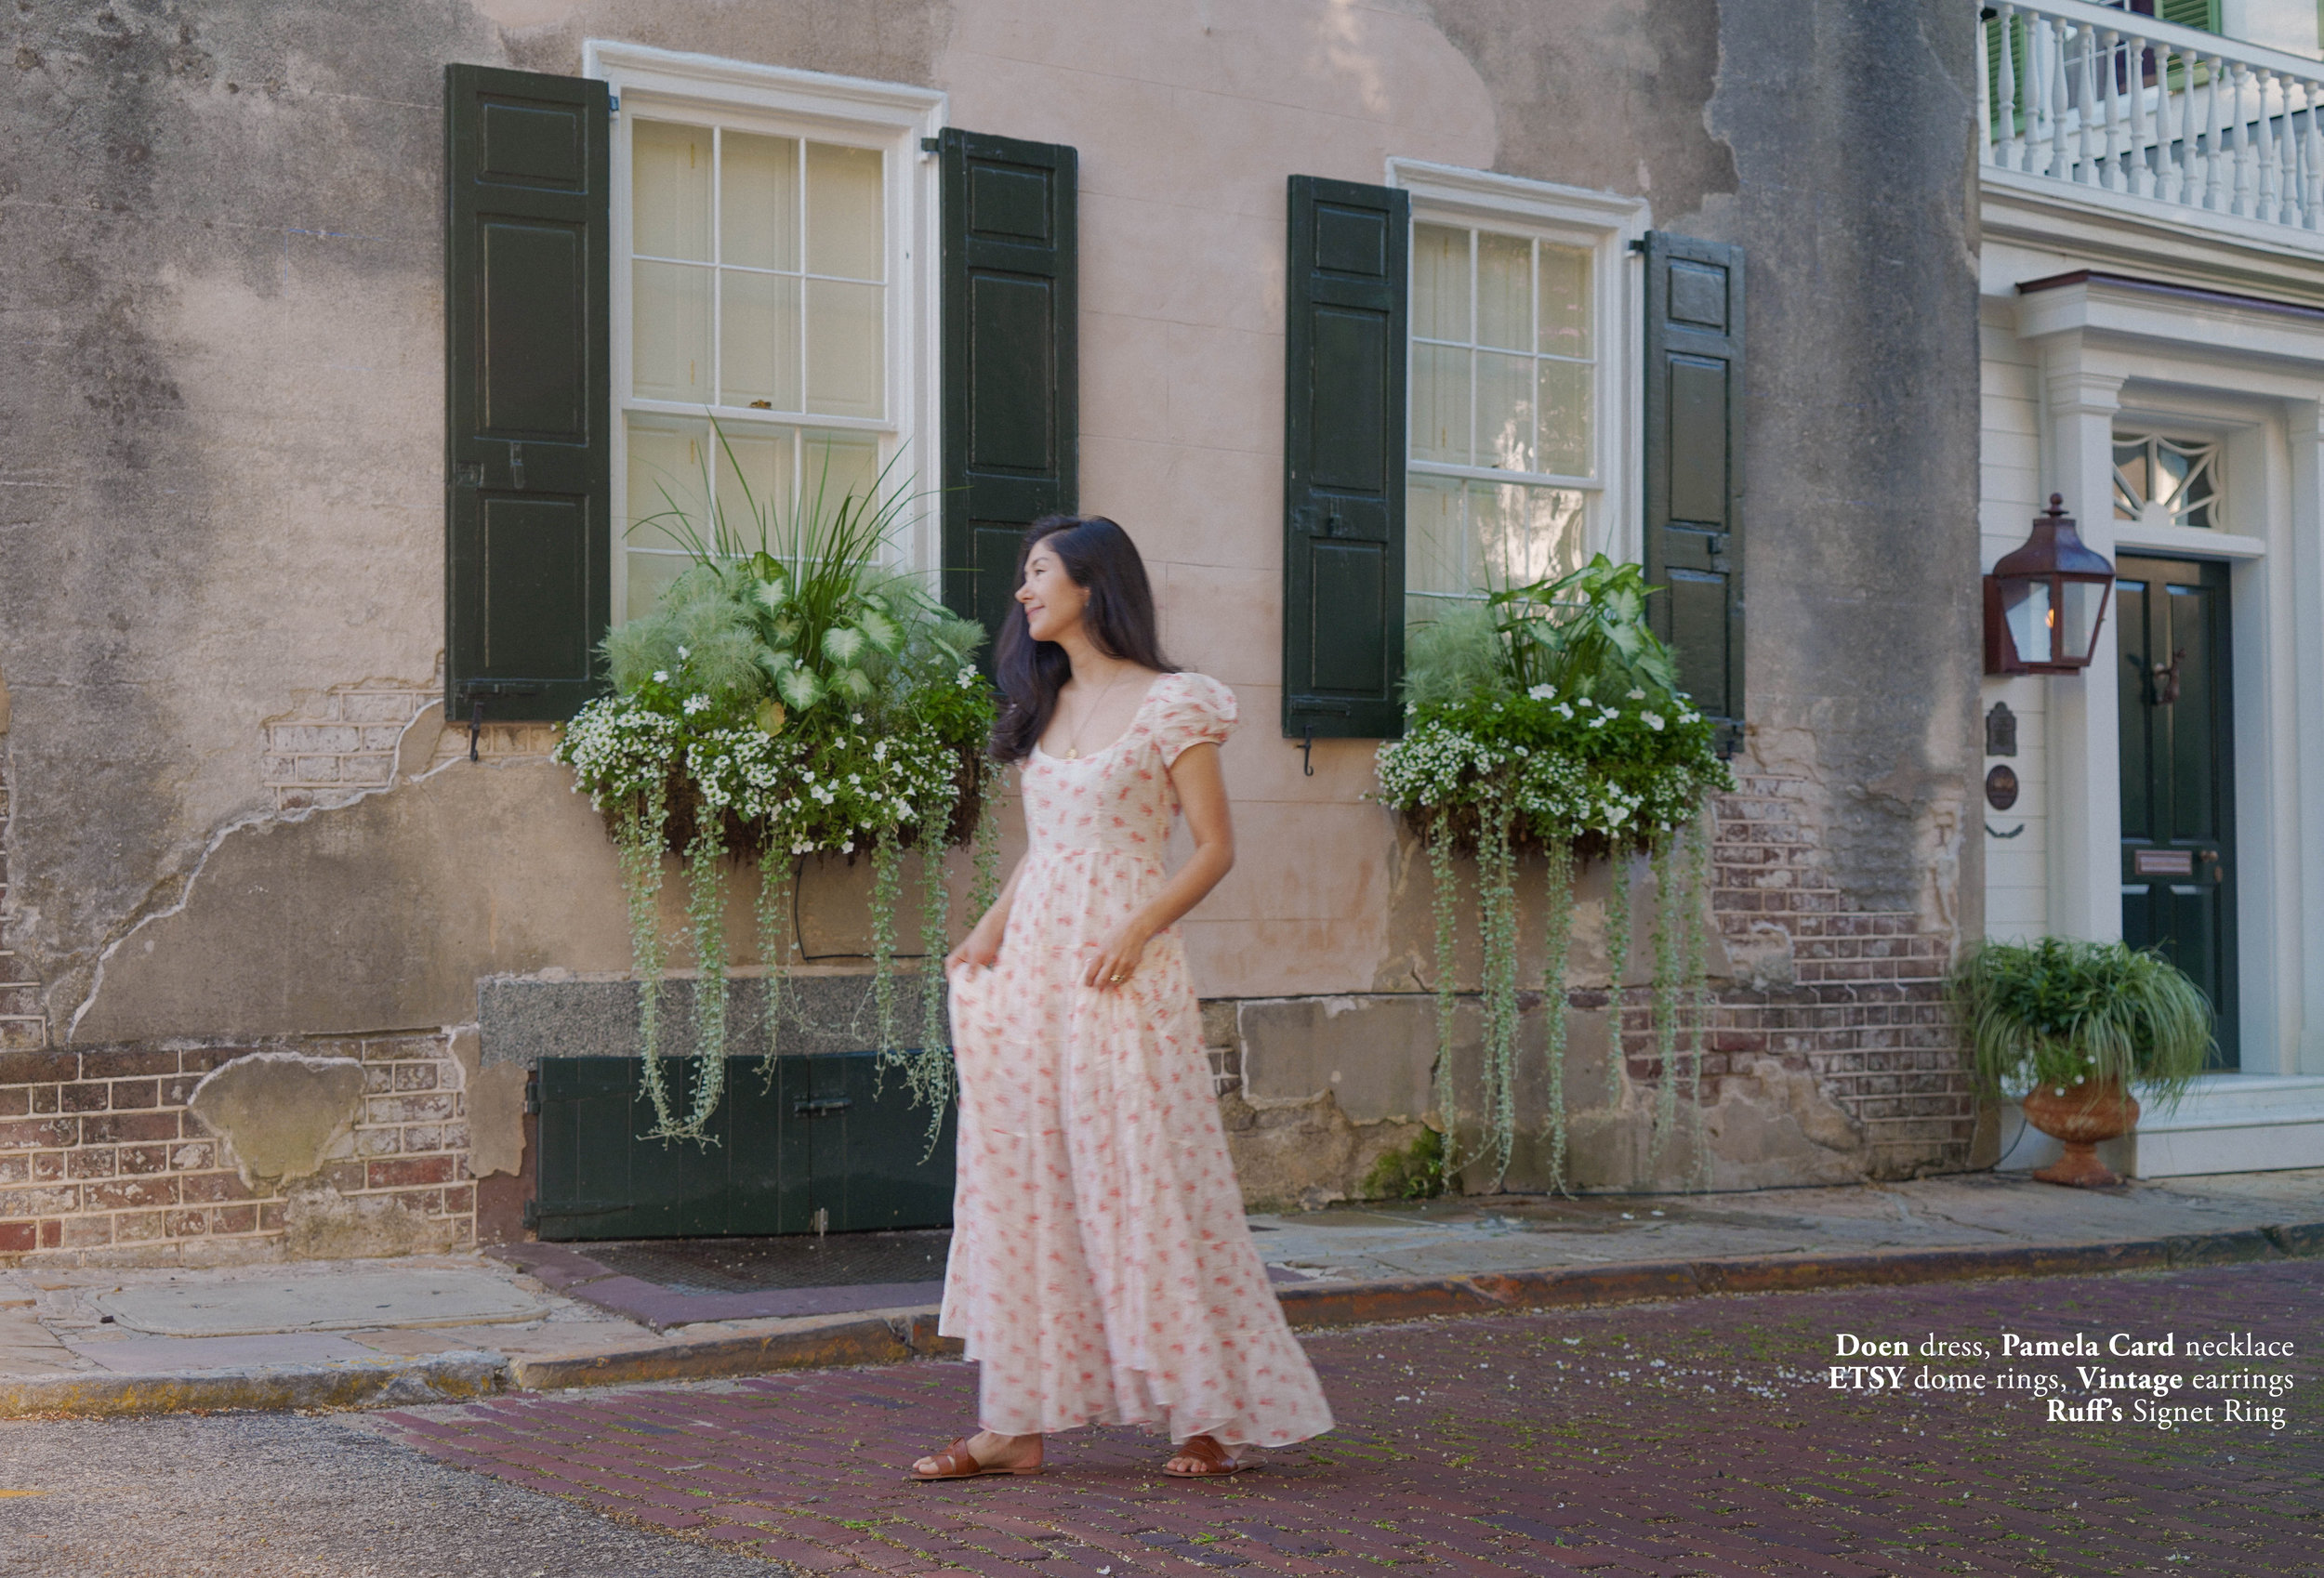 doen dress - floral dress-charleston south carolina-.jpg